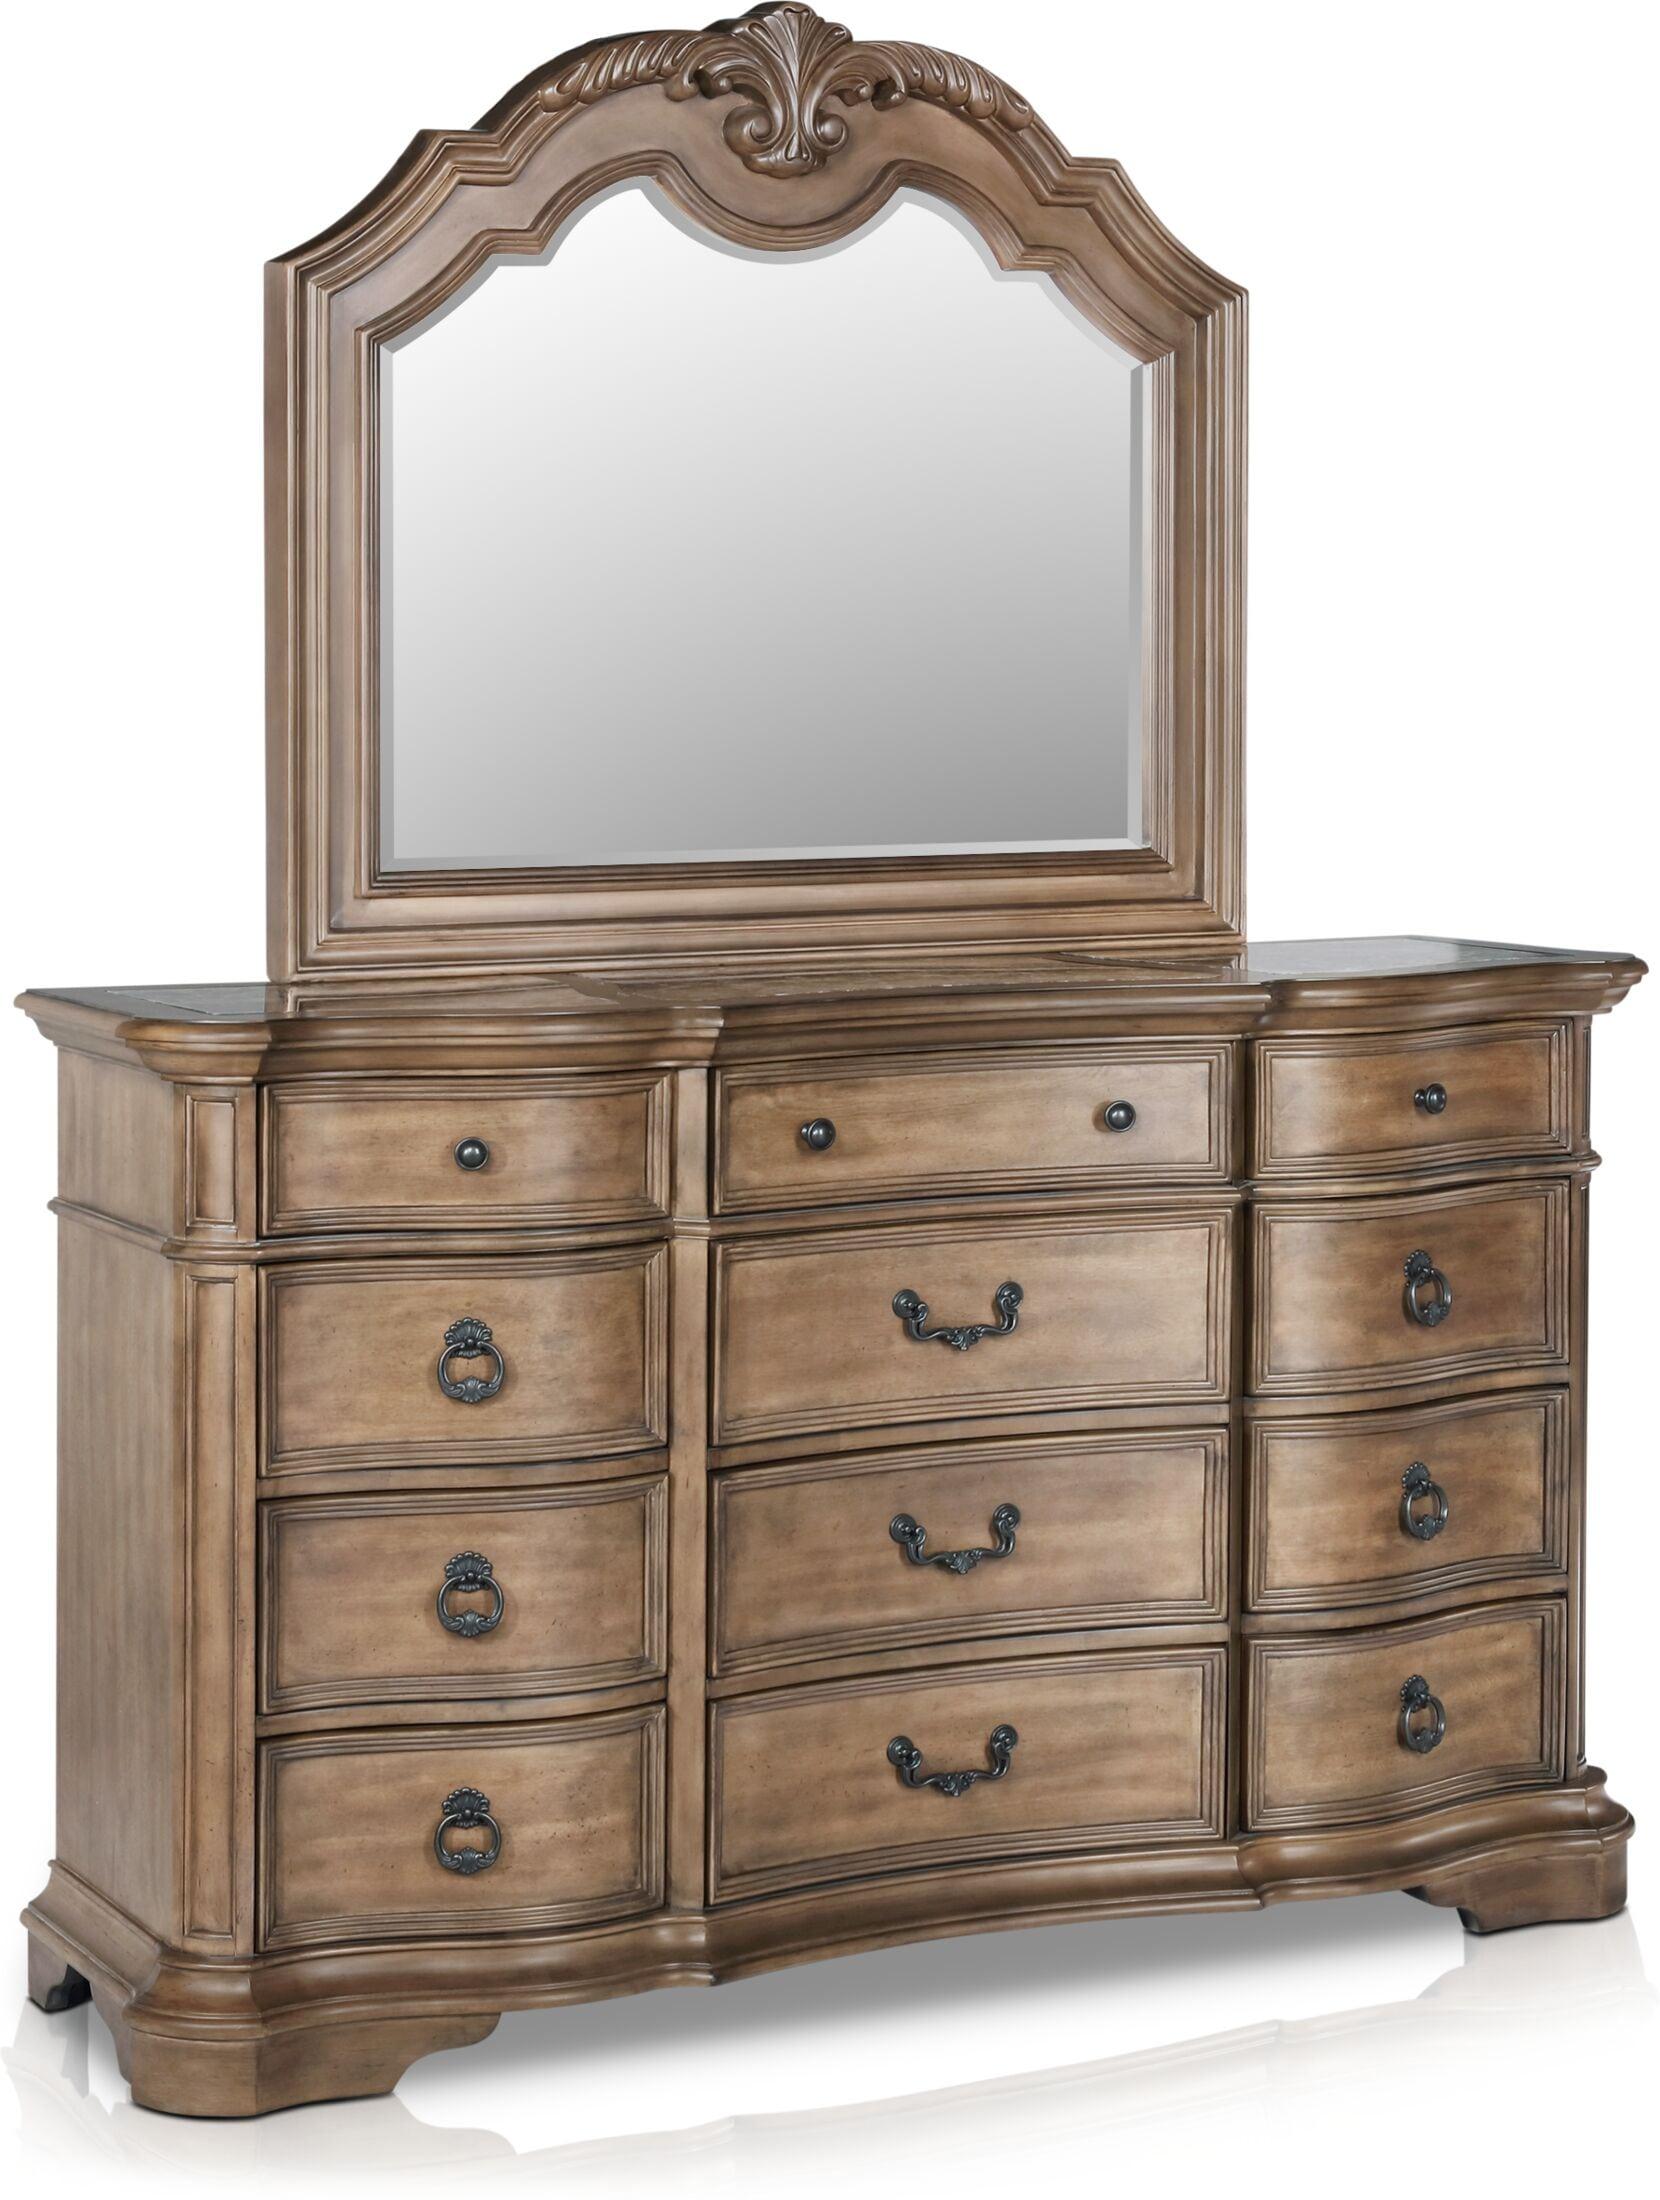 Bedroom Furniture - Gramercy Park Dresser and Mirror